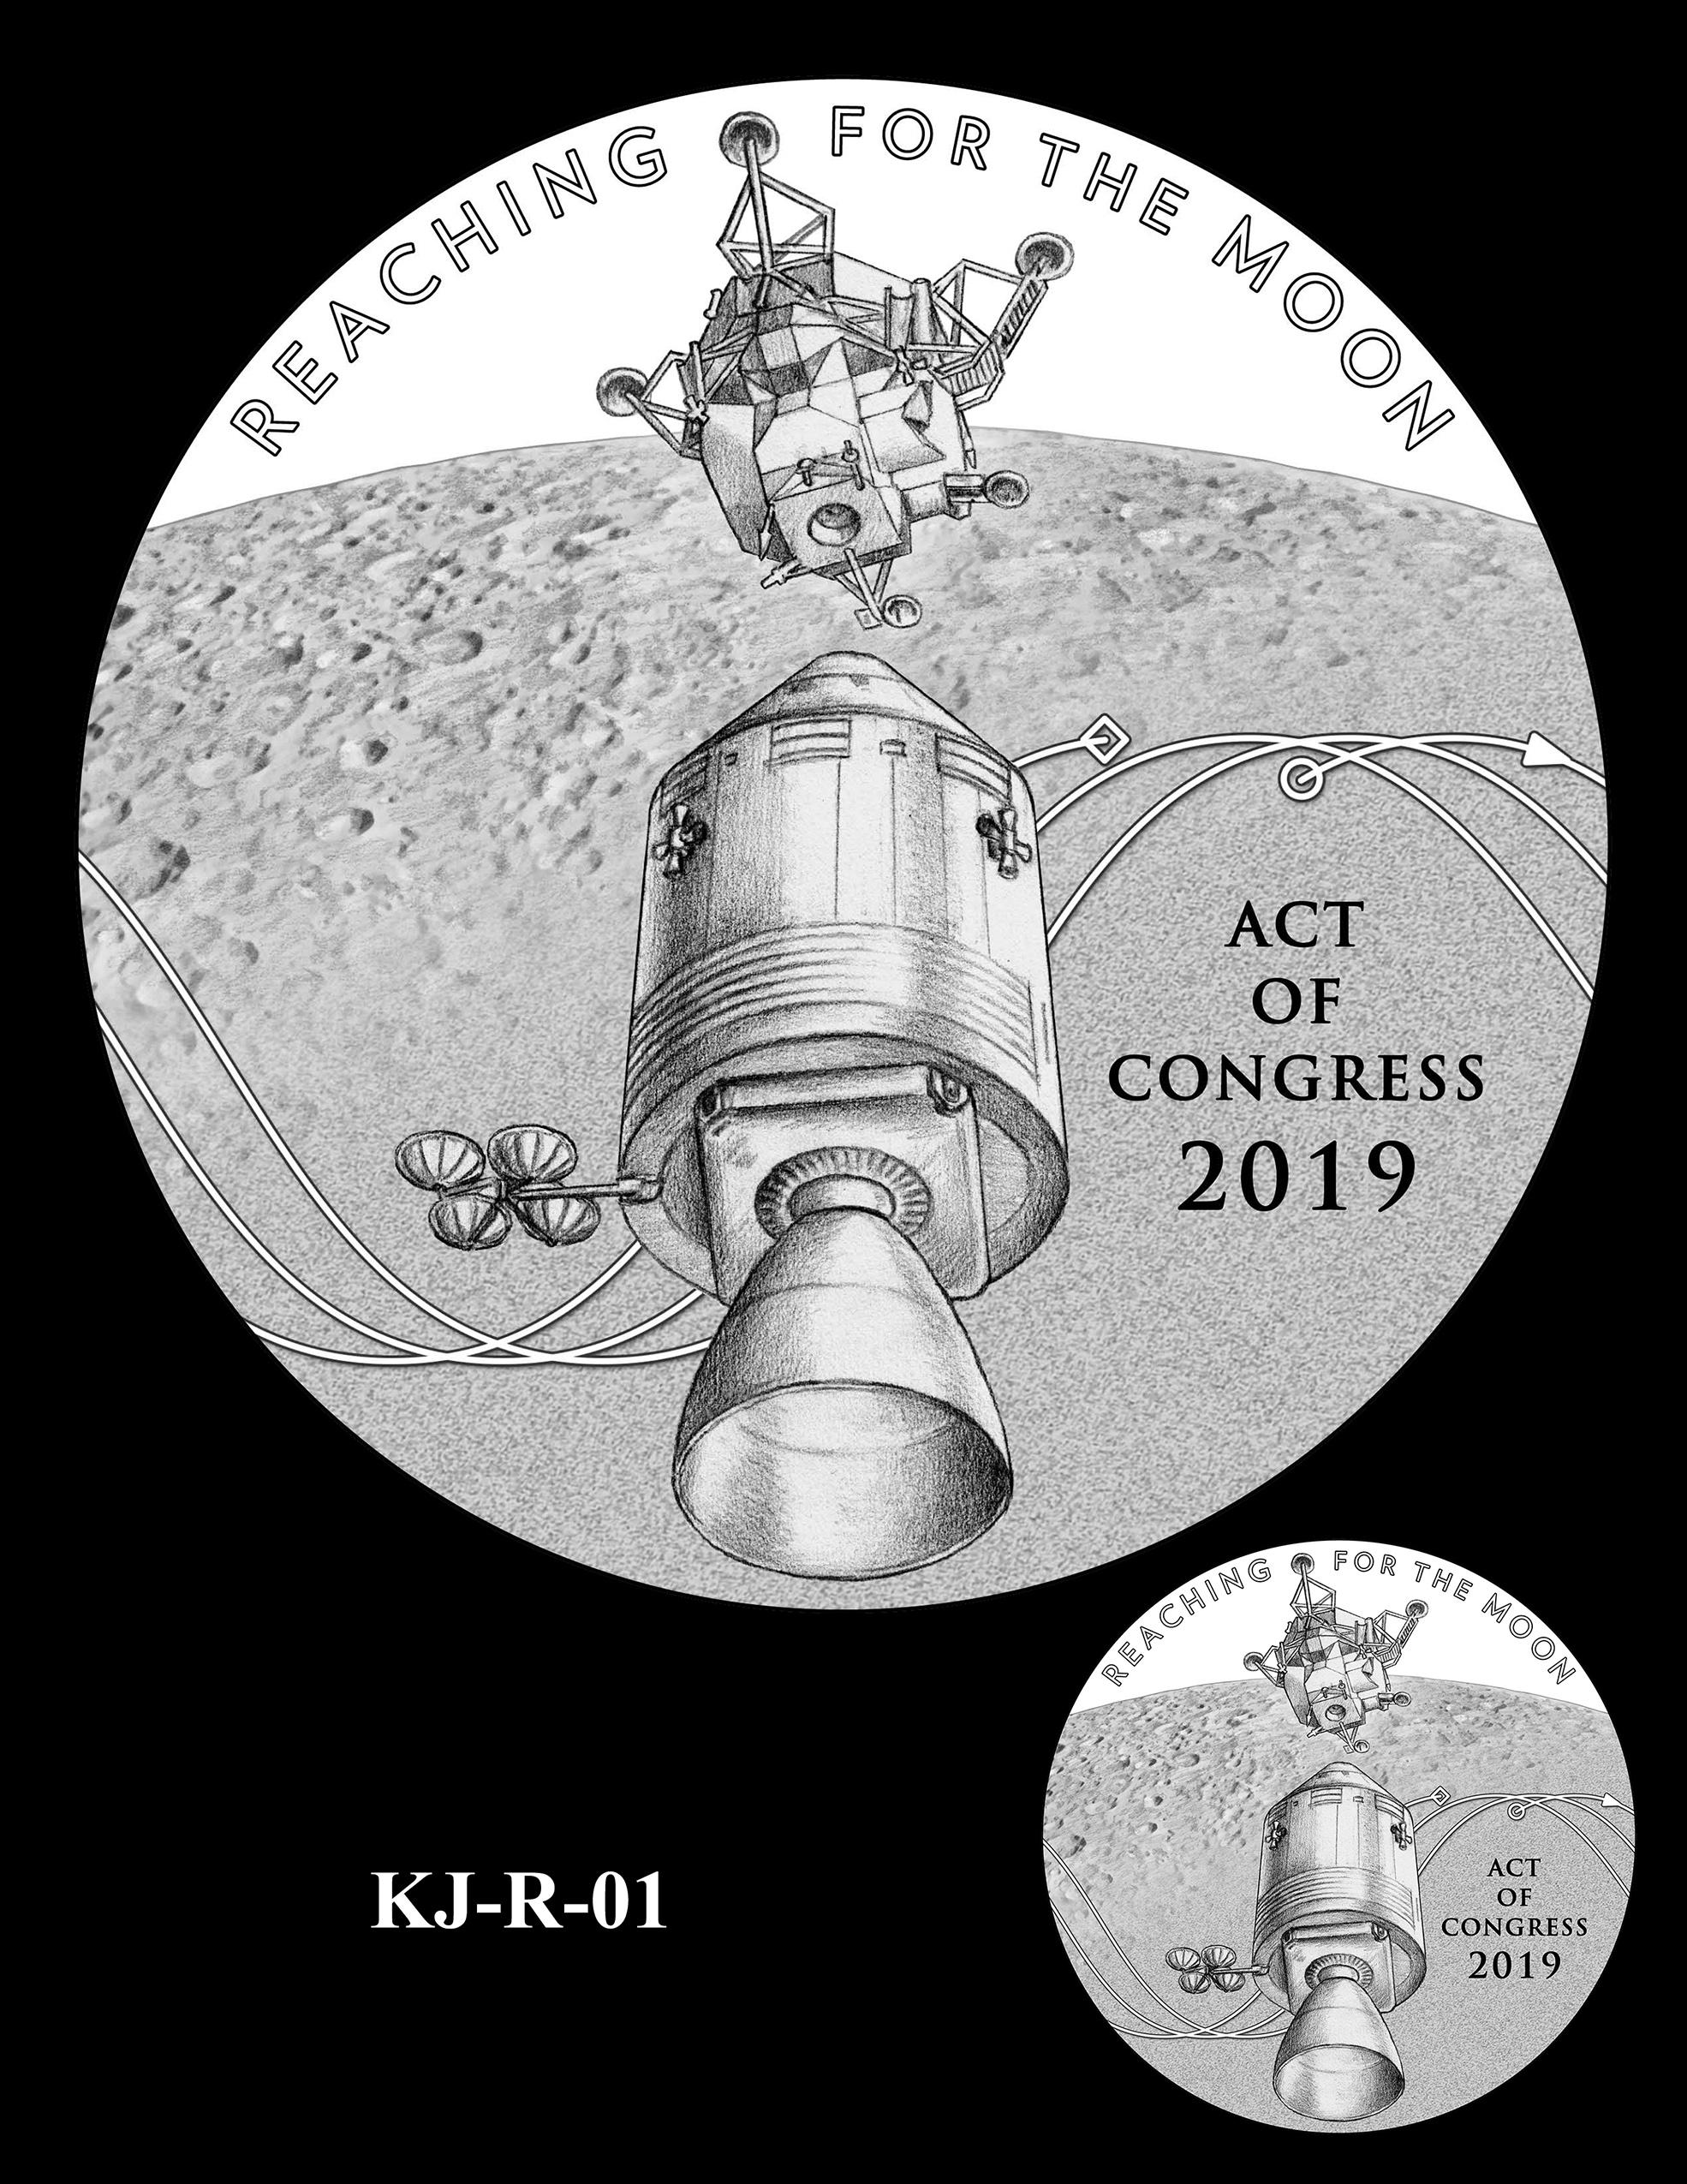 KJ-R-01 -- Katherine Johnson Congressional Gold Medal